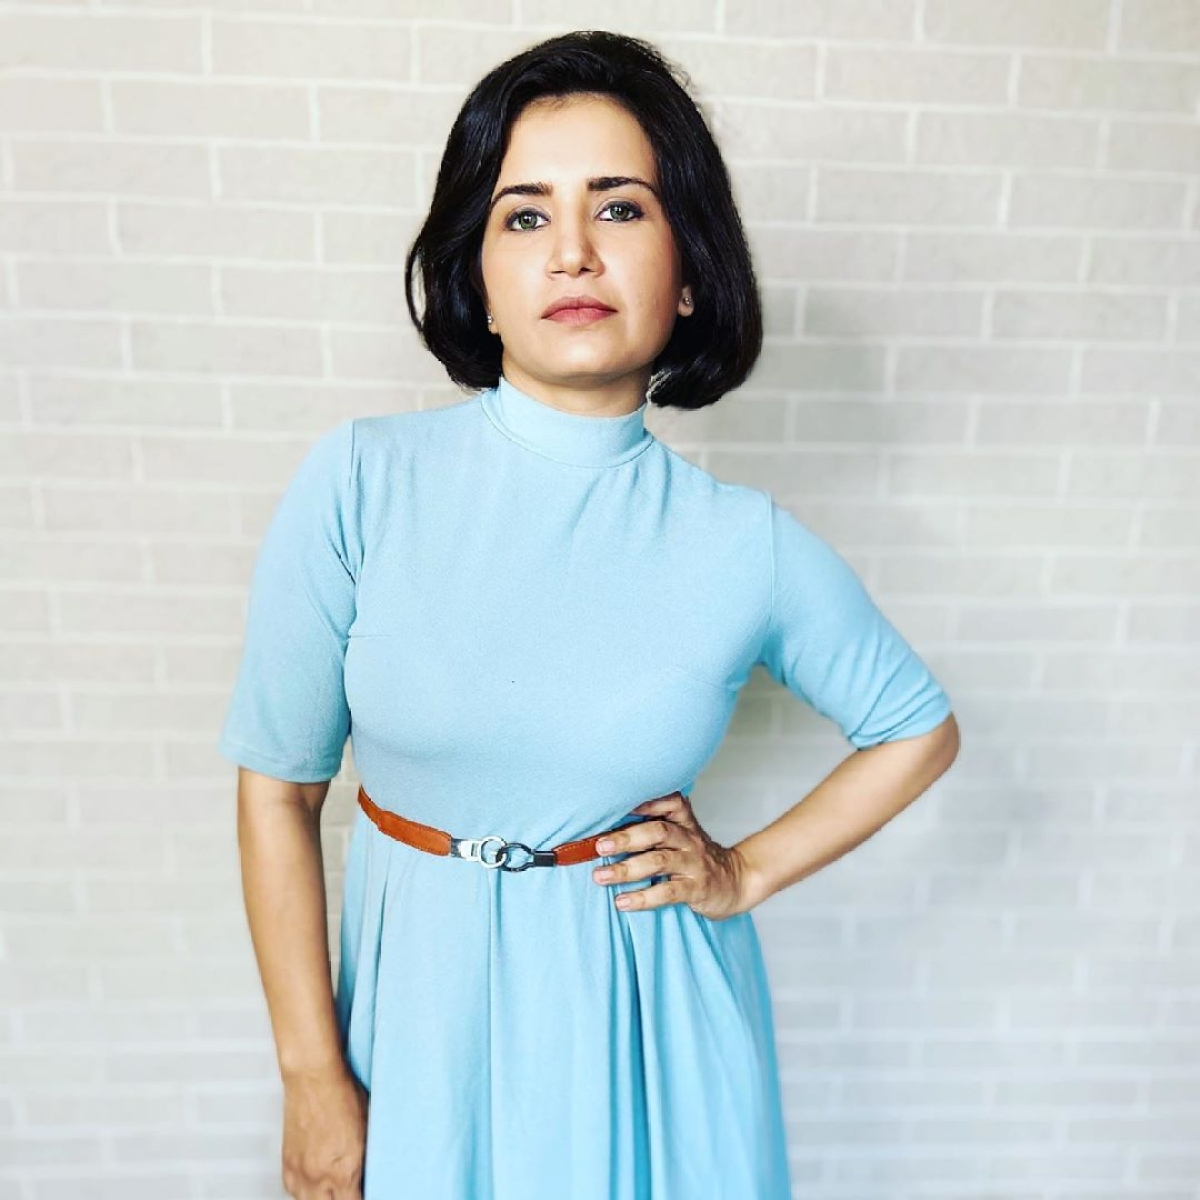 'Taarak Mehta Ka Ooltah Chashmah' actress Priya Ahuja tests positive for COVID-19